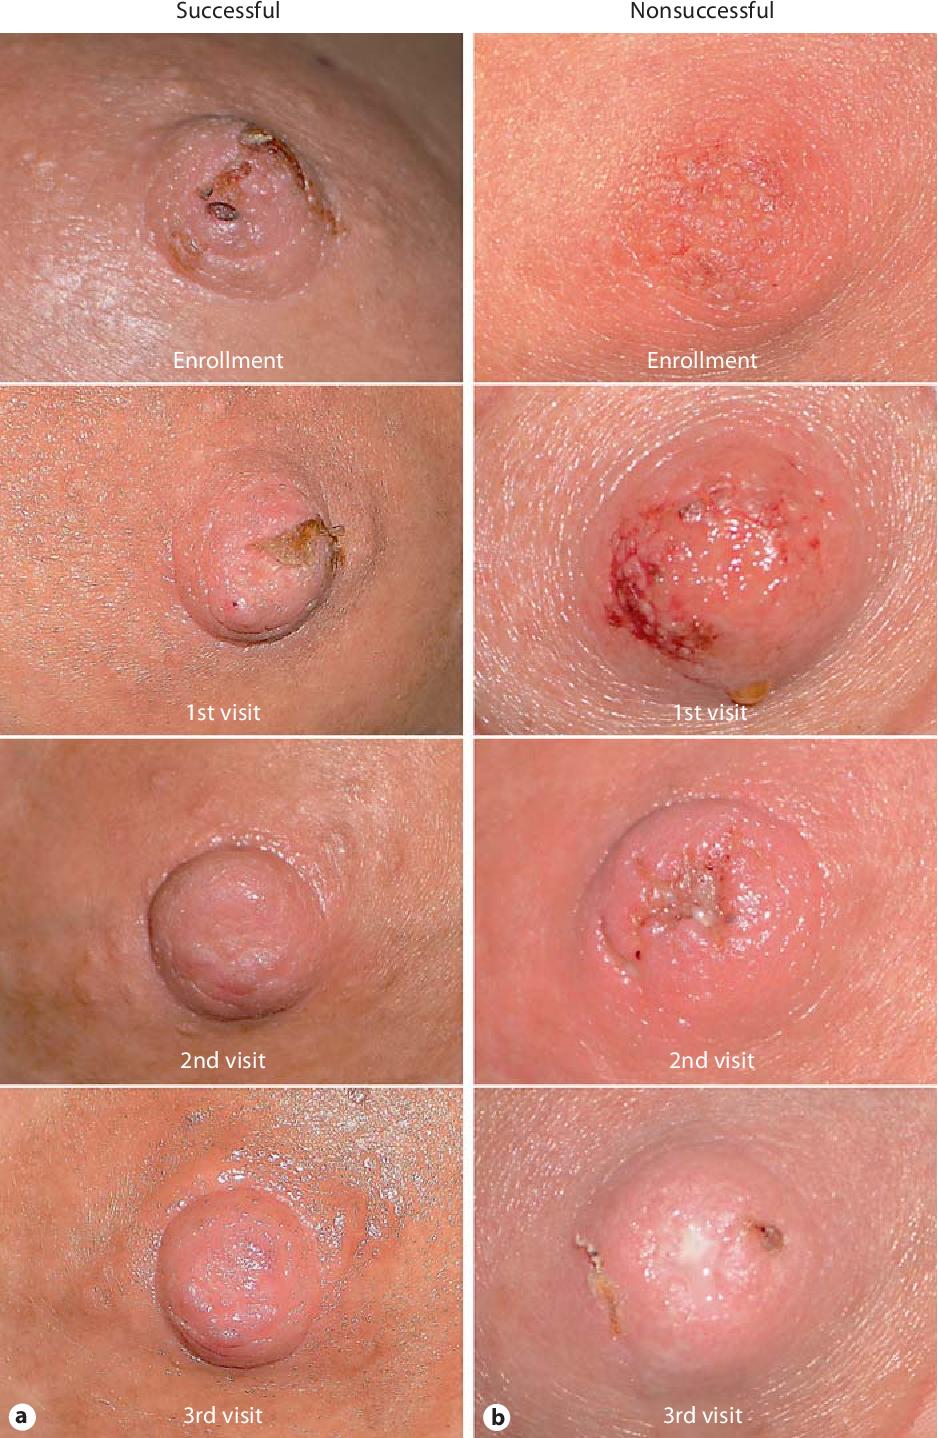 Causes of nipple pain